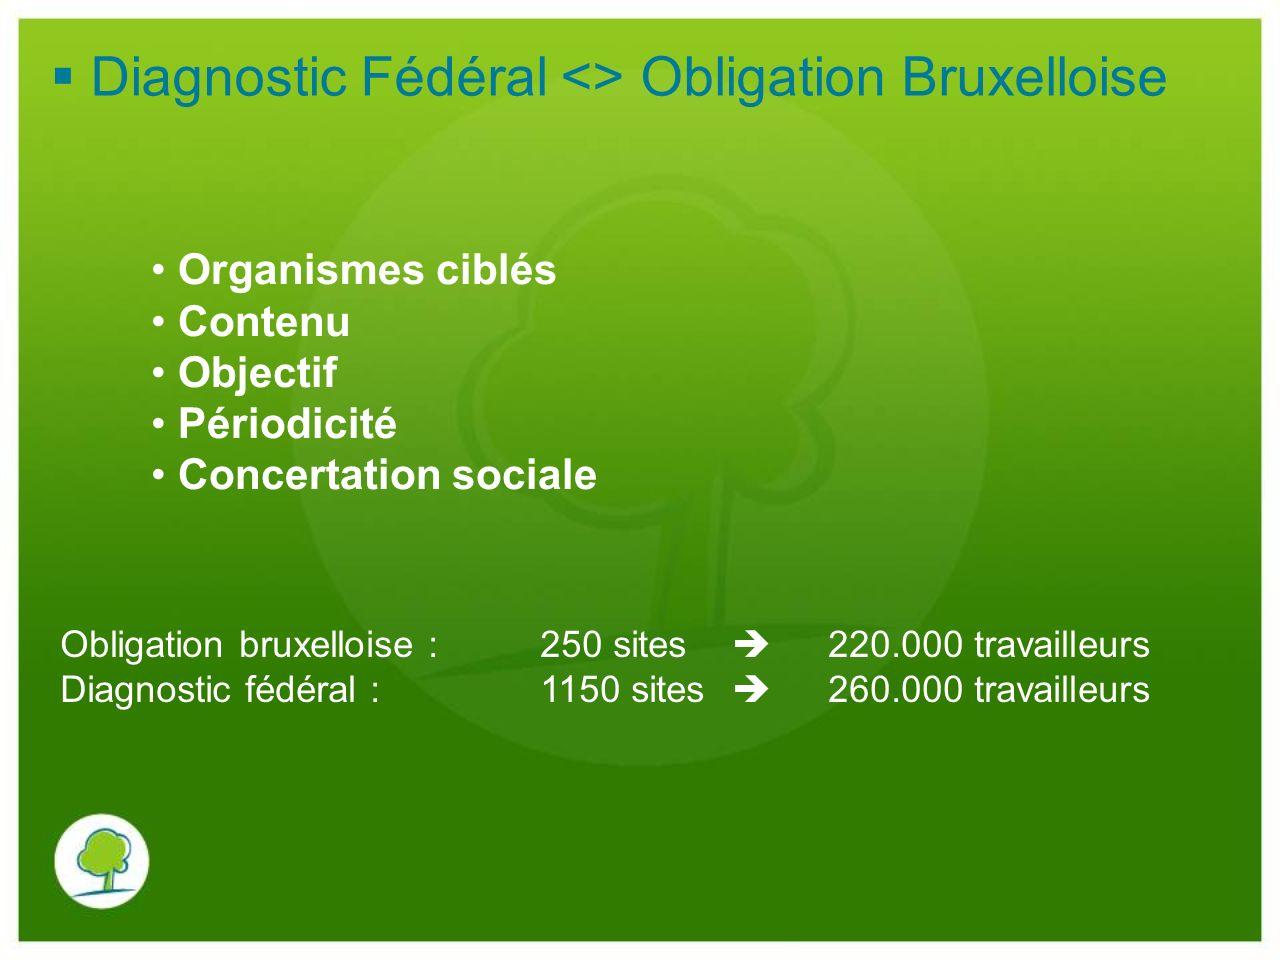 Diagnostic Fédéral <> Obligation Bruxelloise Organismes ciblés Contenu Objectif Périodicité Concertation sociale Obligation bruxelloise :250 sites 220